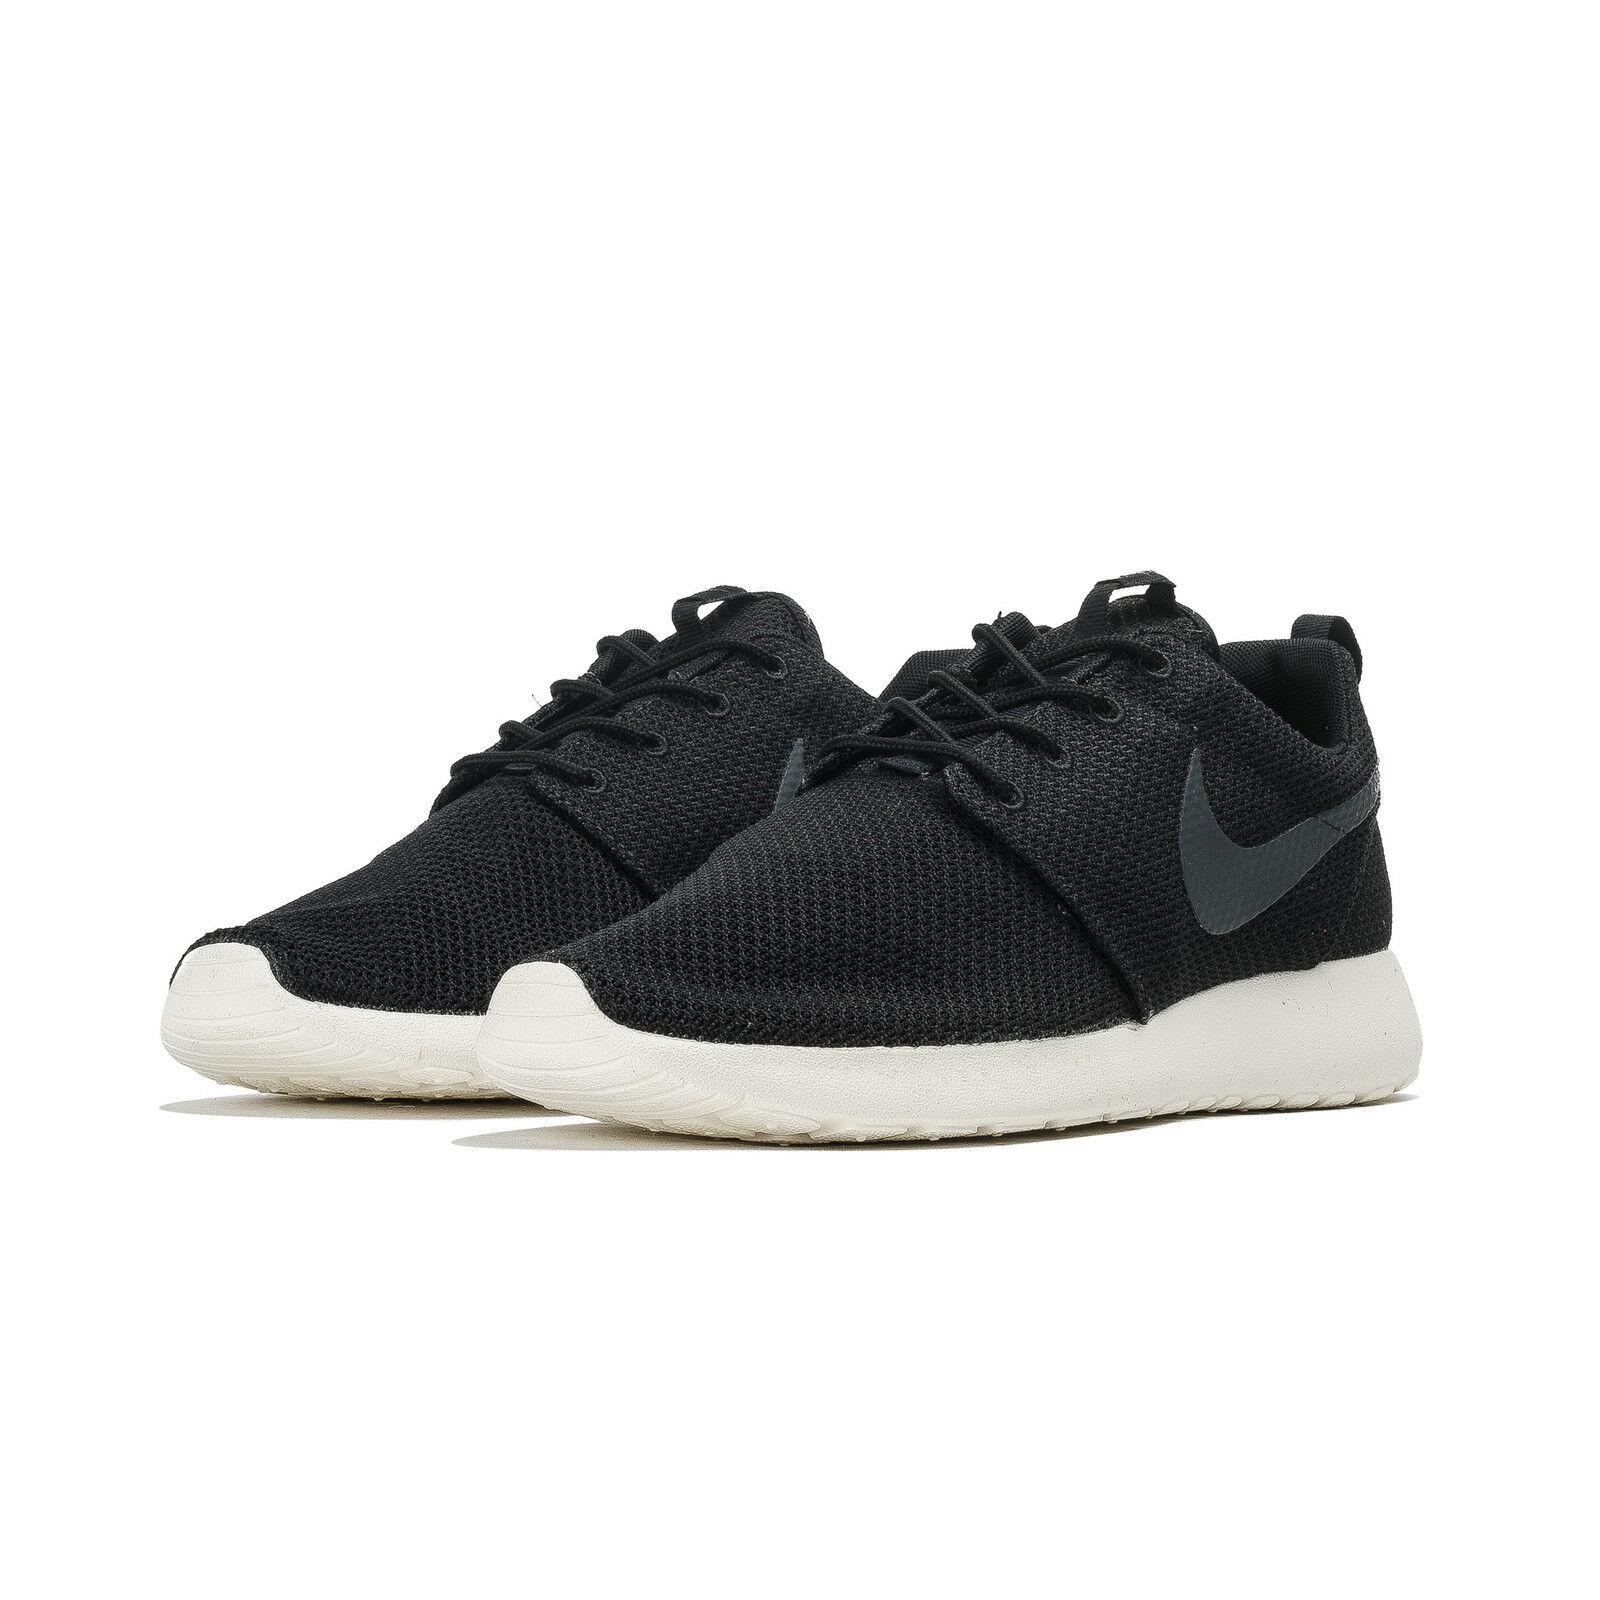 Nike uno Roshe One todas las tallas Negro/Marino Rosherun uno Nike DS 511881010 Envío Gratuito 89a1a4